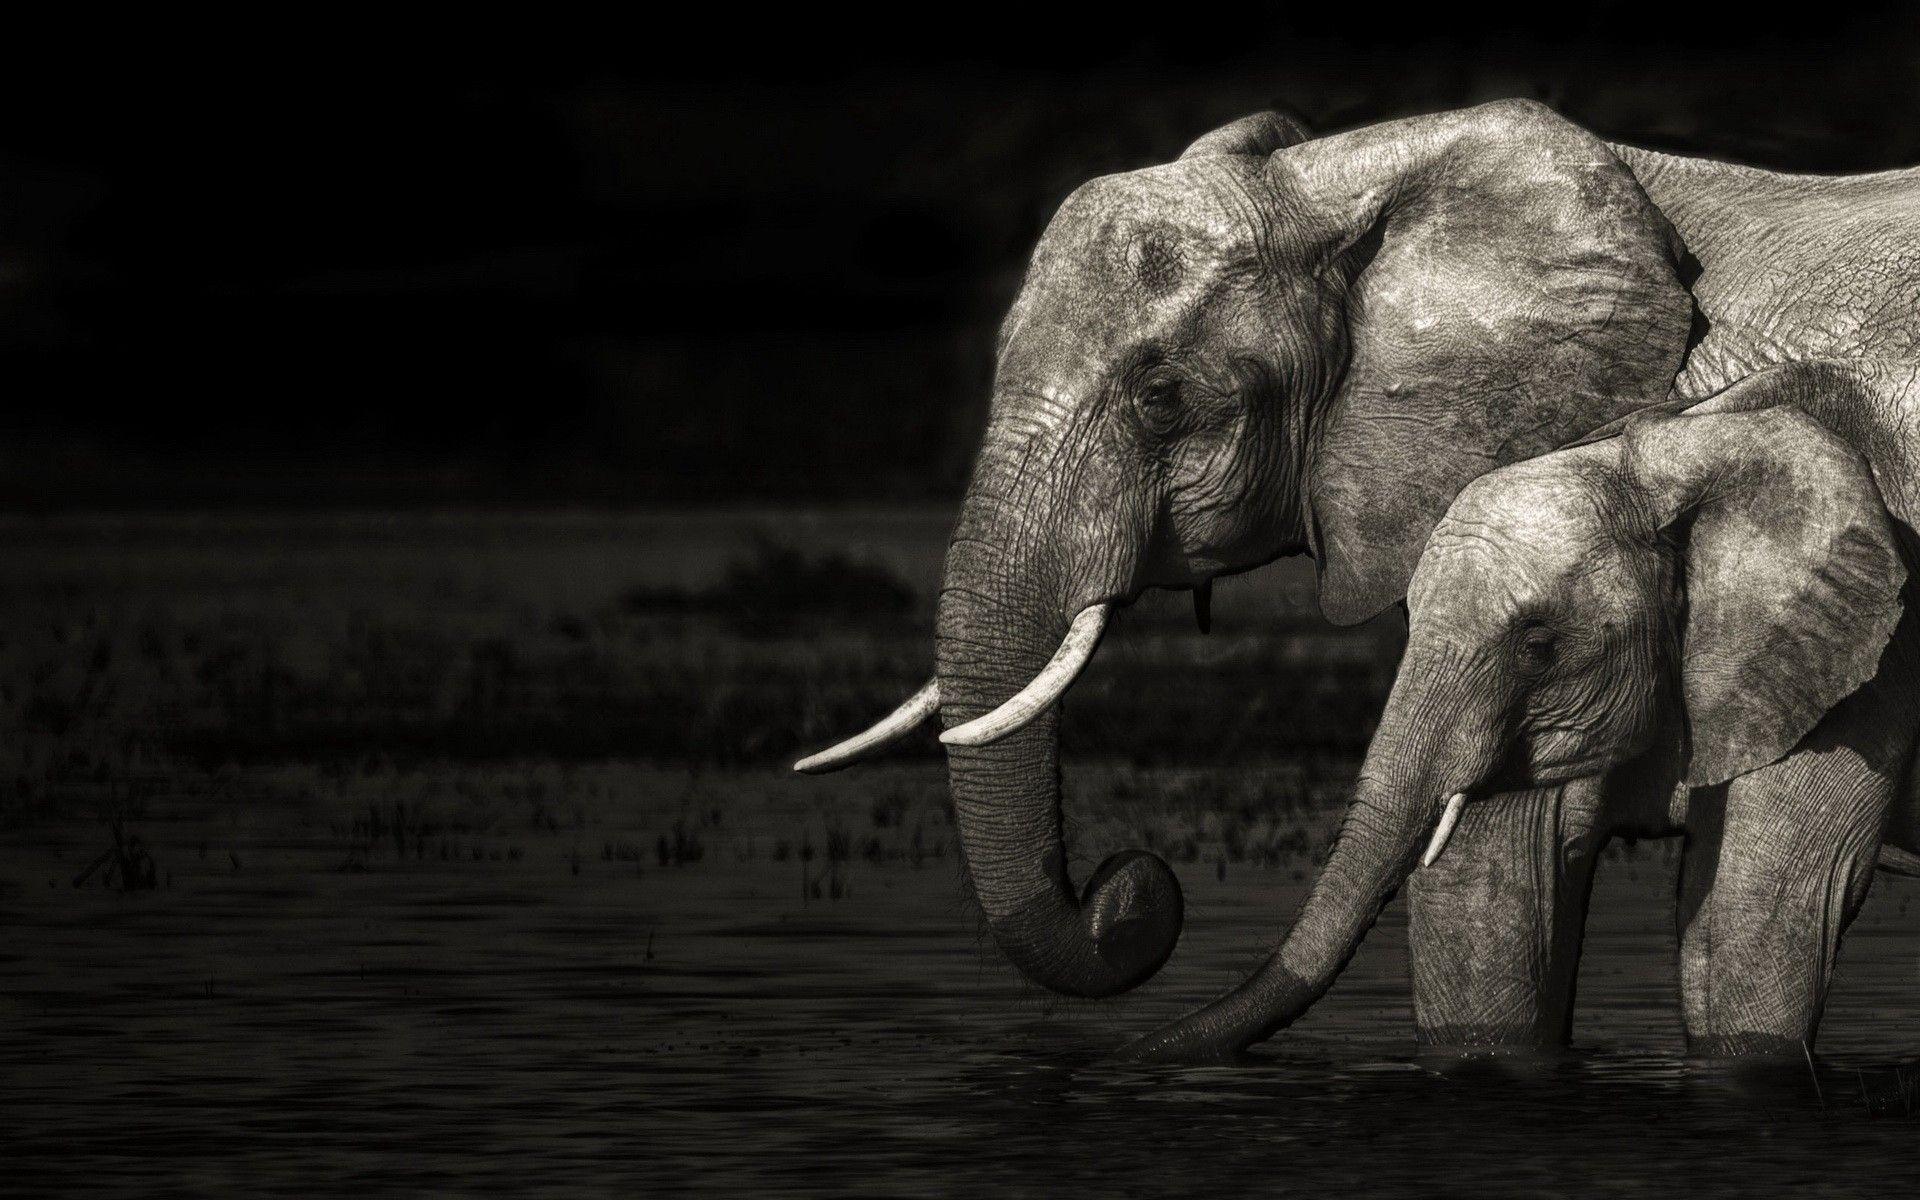 Elephants Black And White Google Search Elephant Wallpaper Elephant Elephant Images